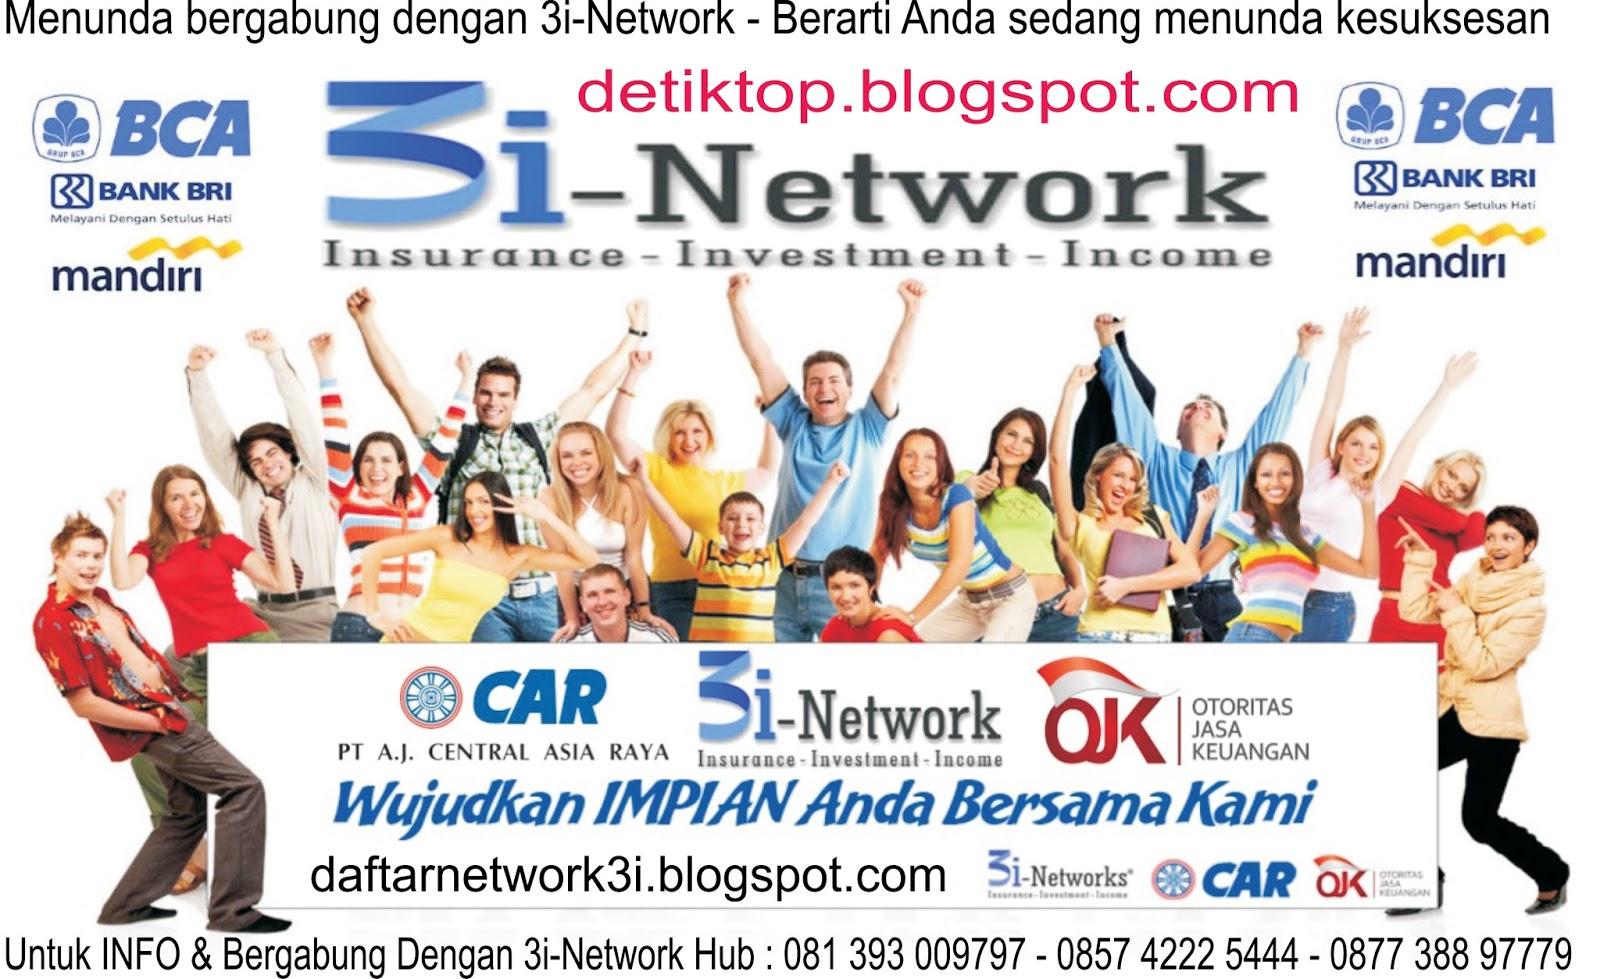 Toko Baja Ringan Kudus Peluang Sukses Utk : Guru, Dosen, Karyawan, Ojek, Sopir ...